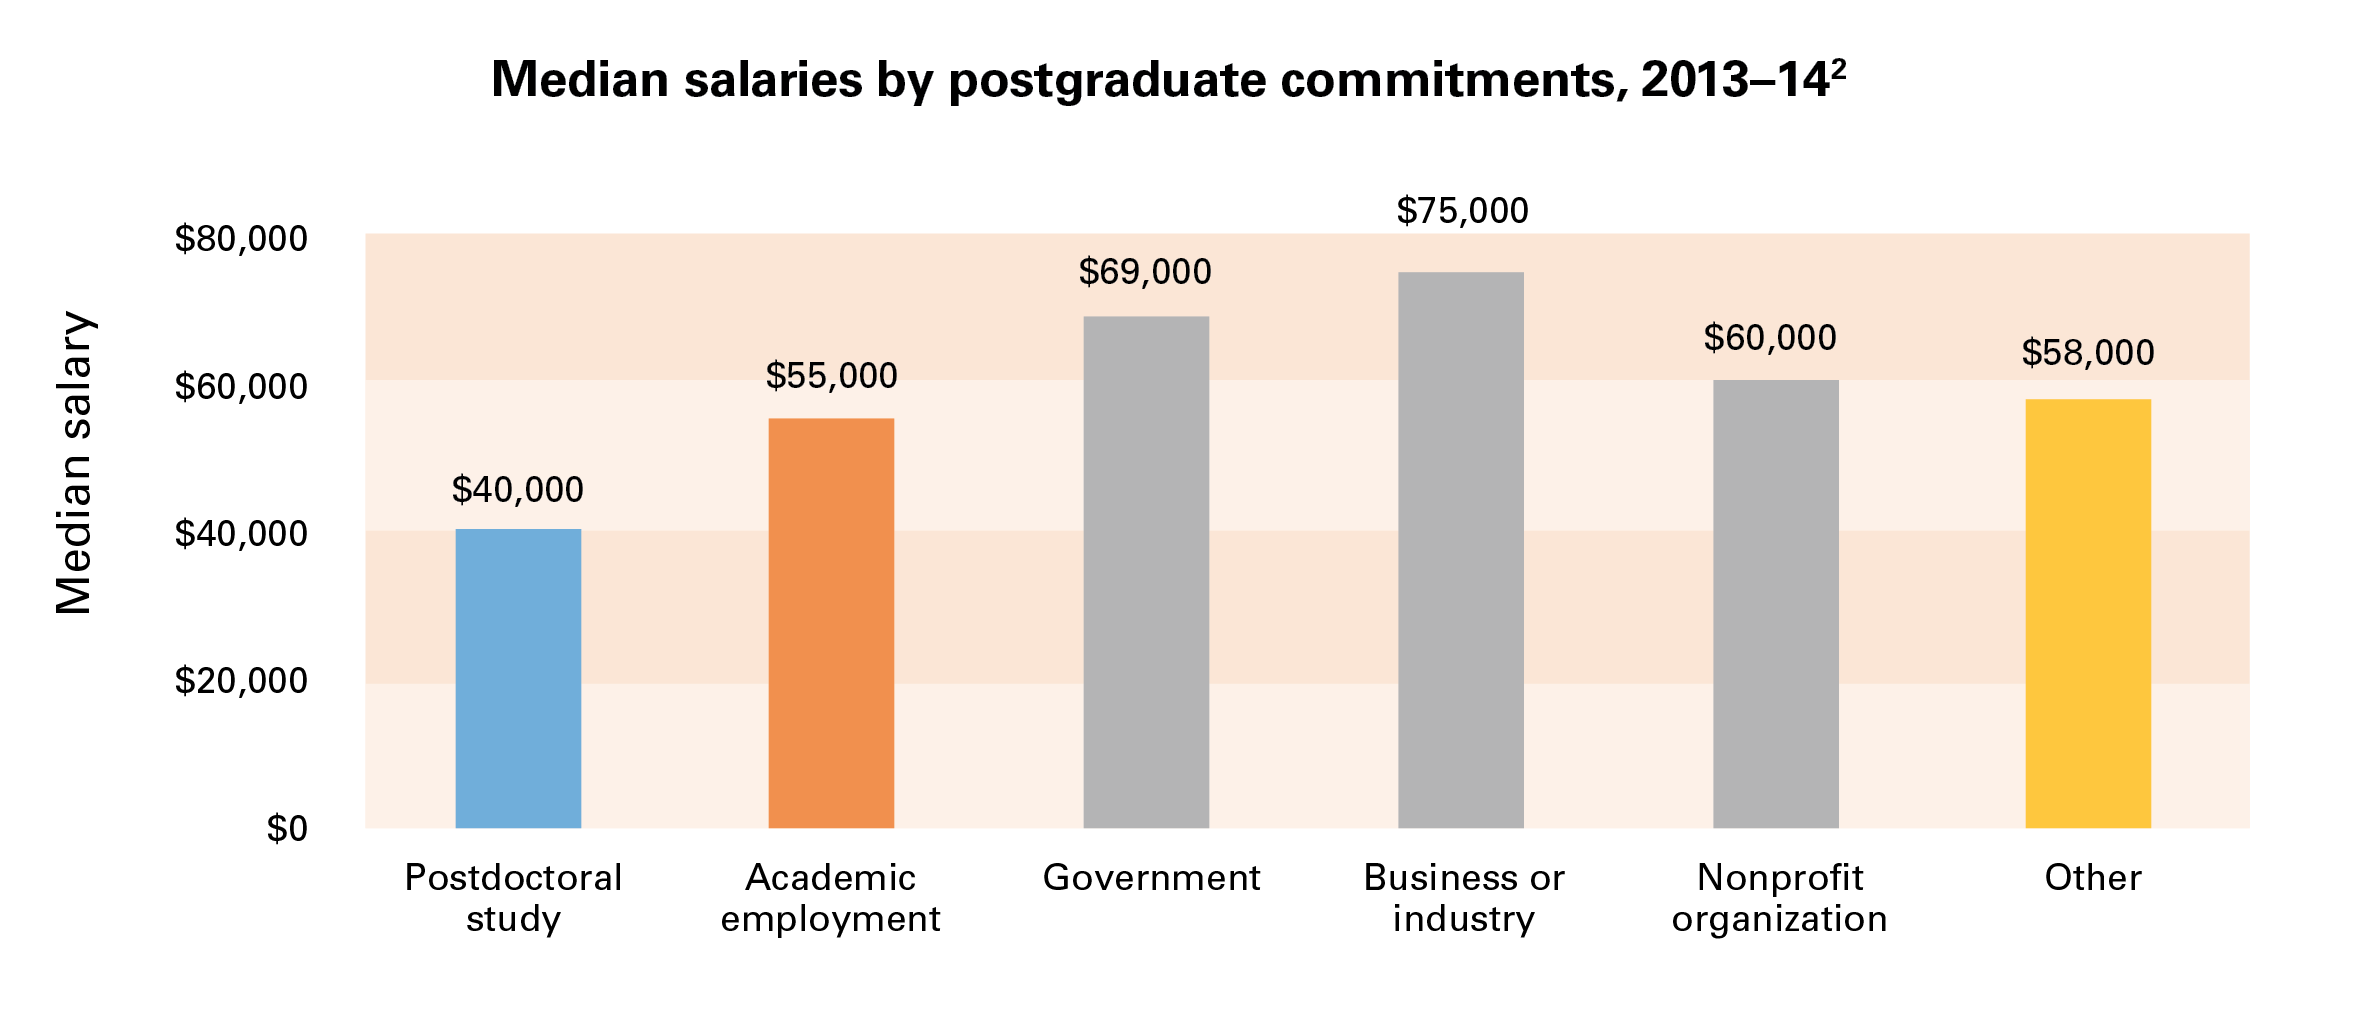 Median salaries by postgraduate commitments, 2013-14